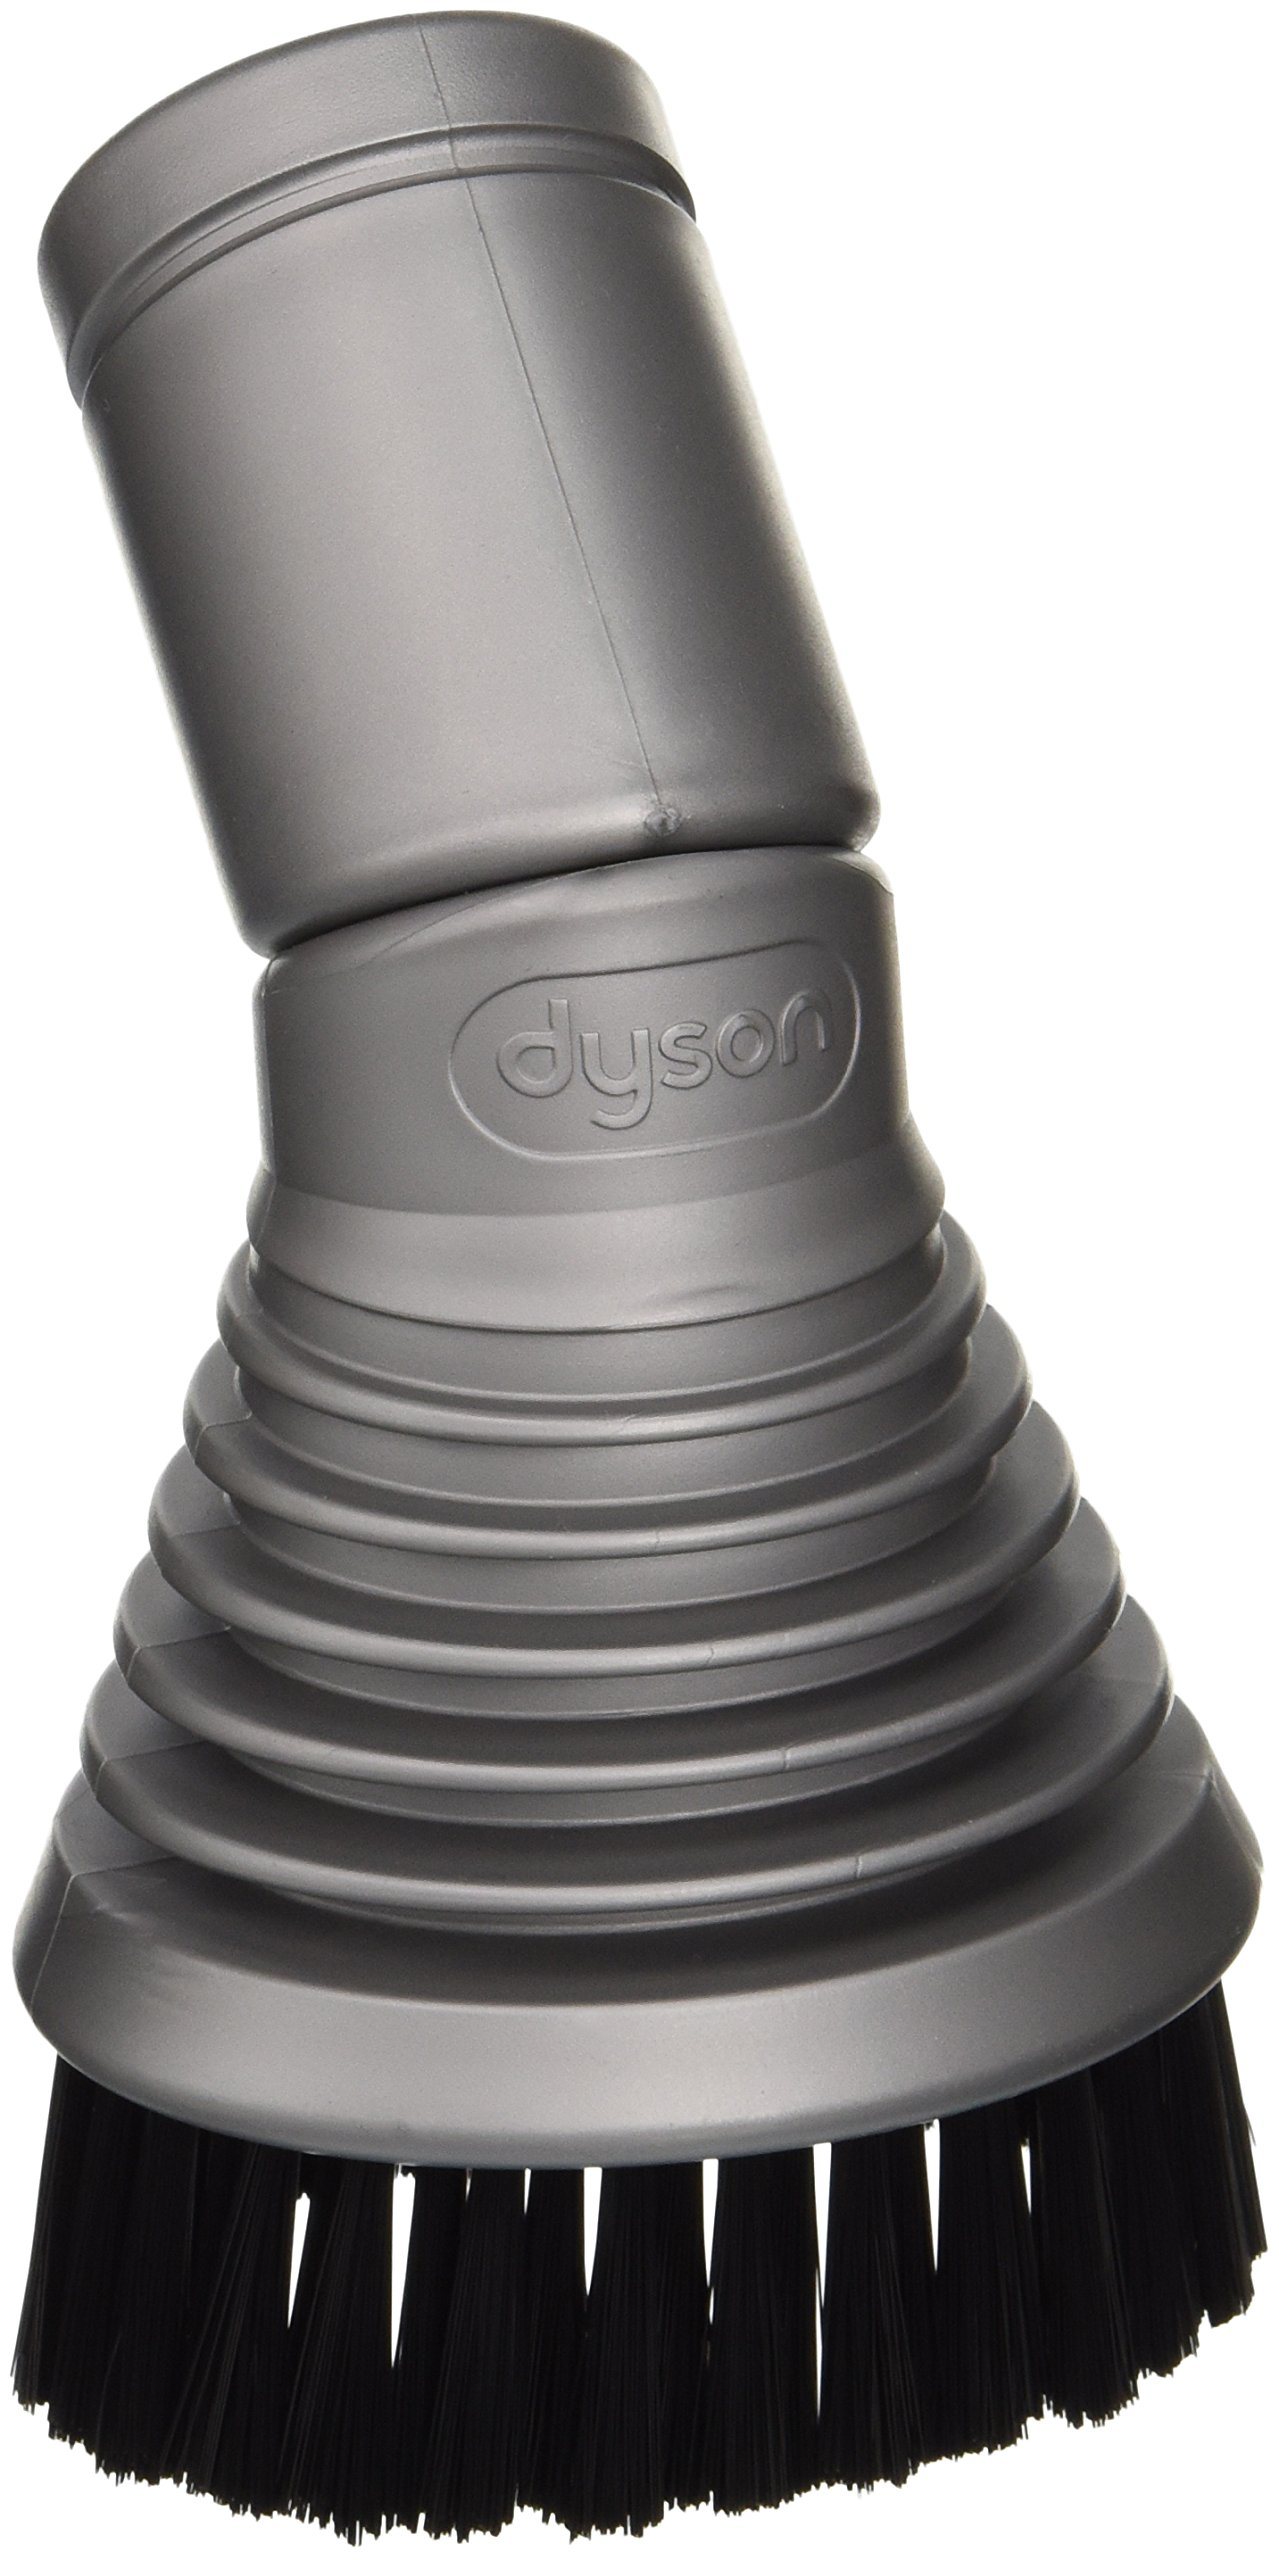 Genuine Dyson DC07, DC14 Brush Tool #900188-16